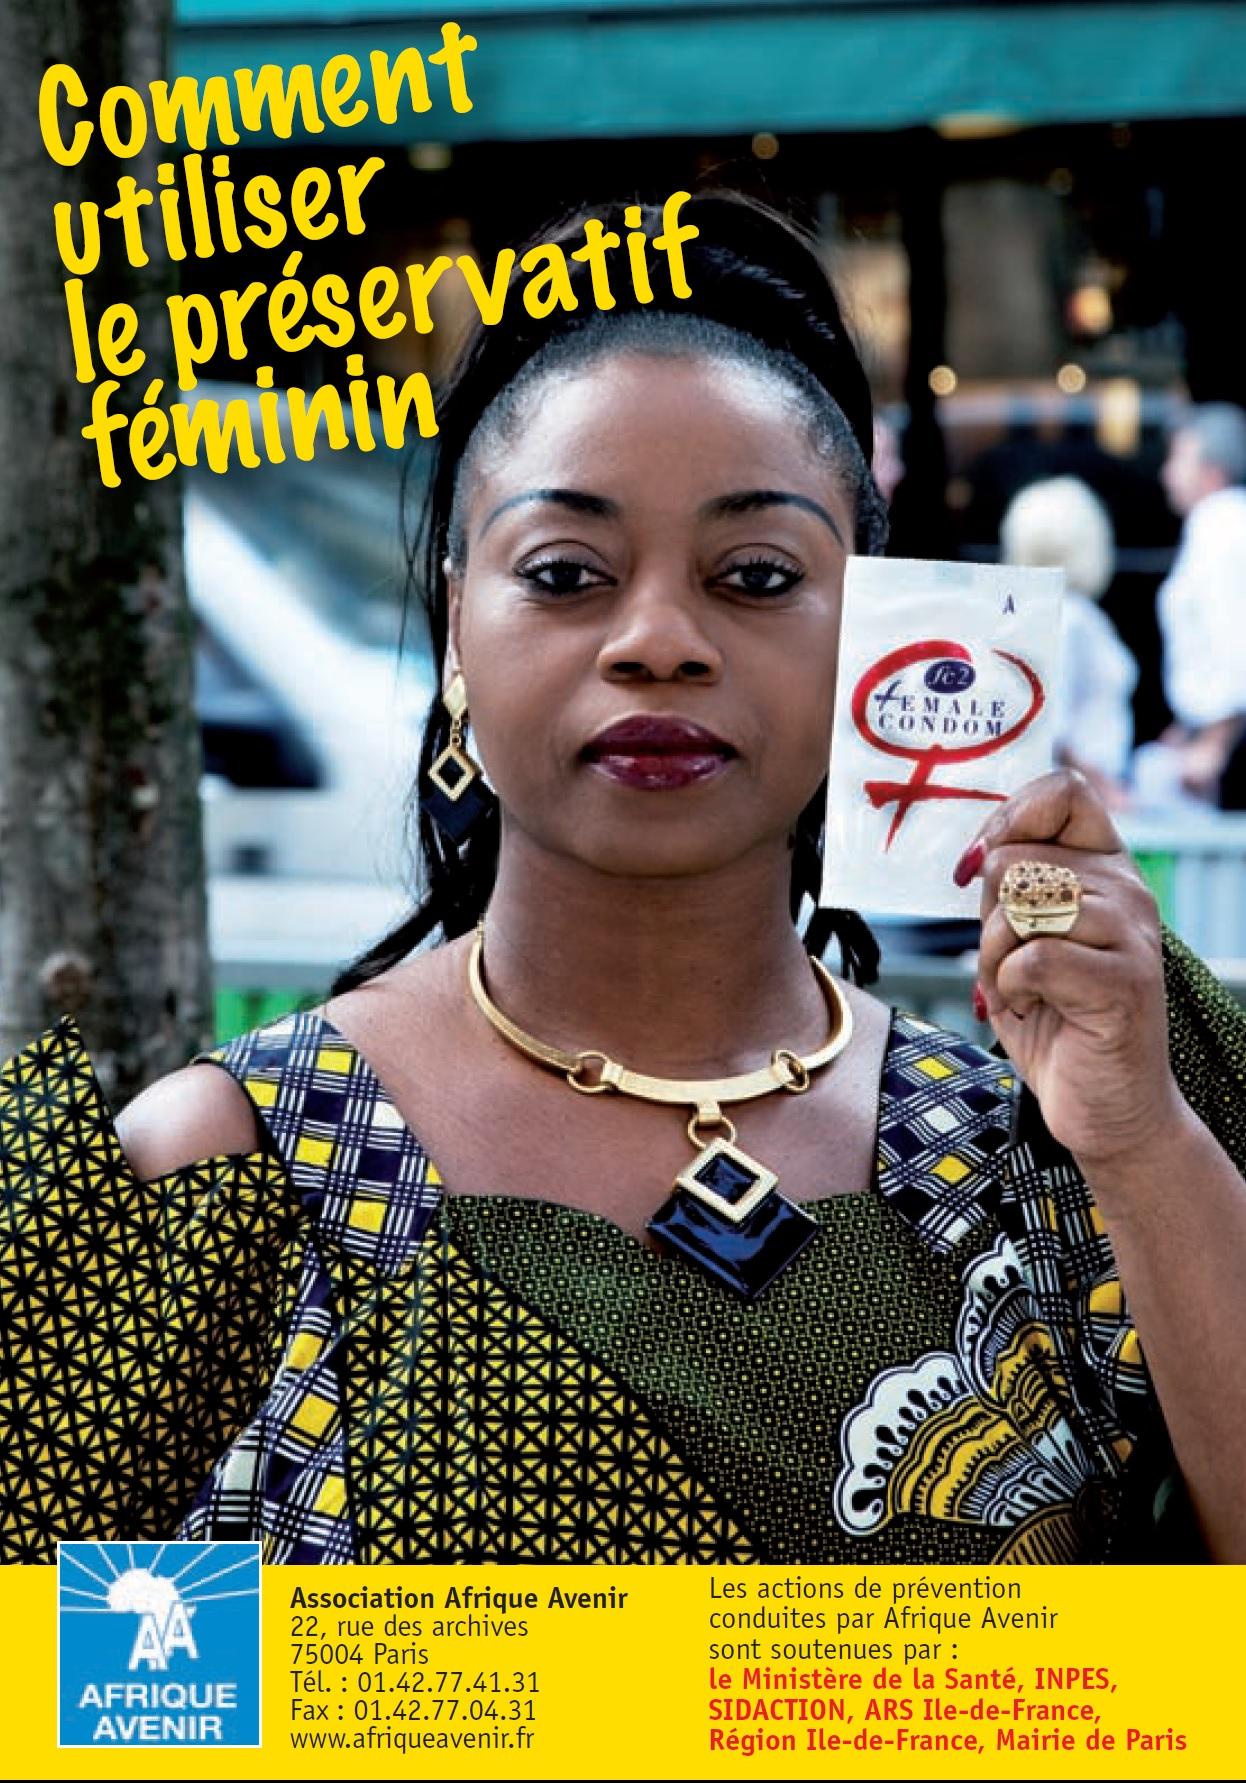 Mode d'emploi préservatif féminin